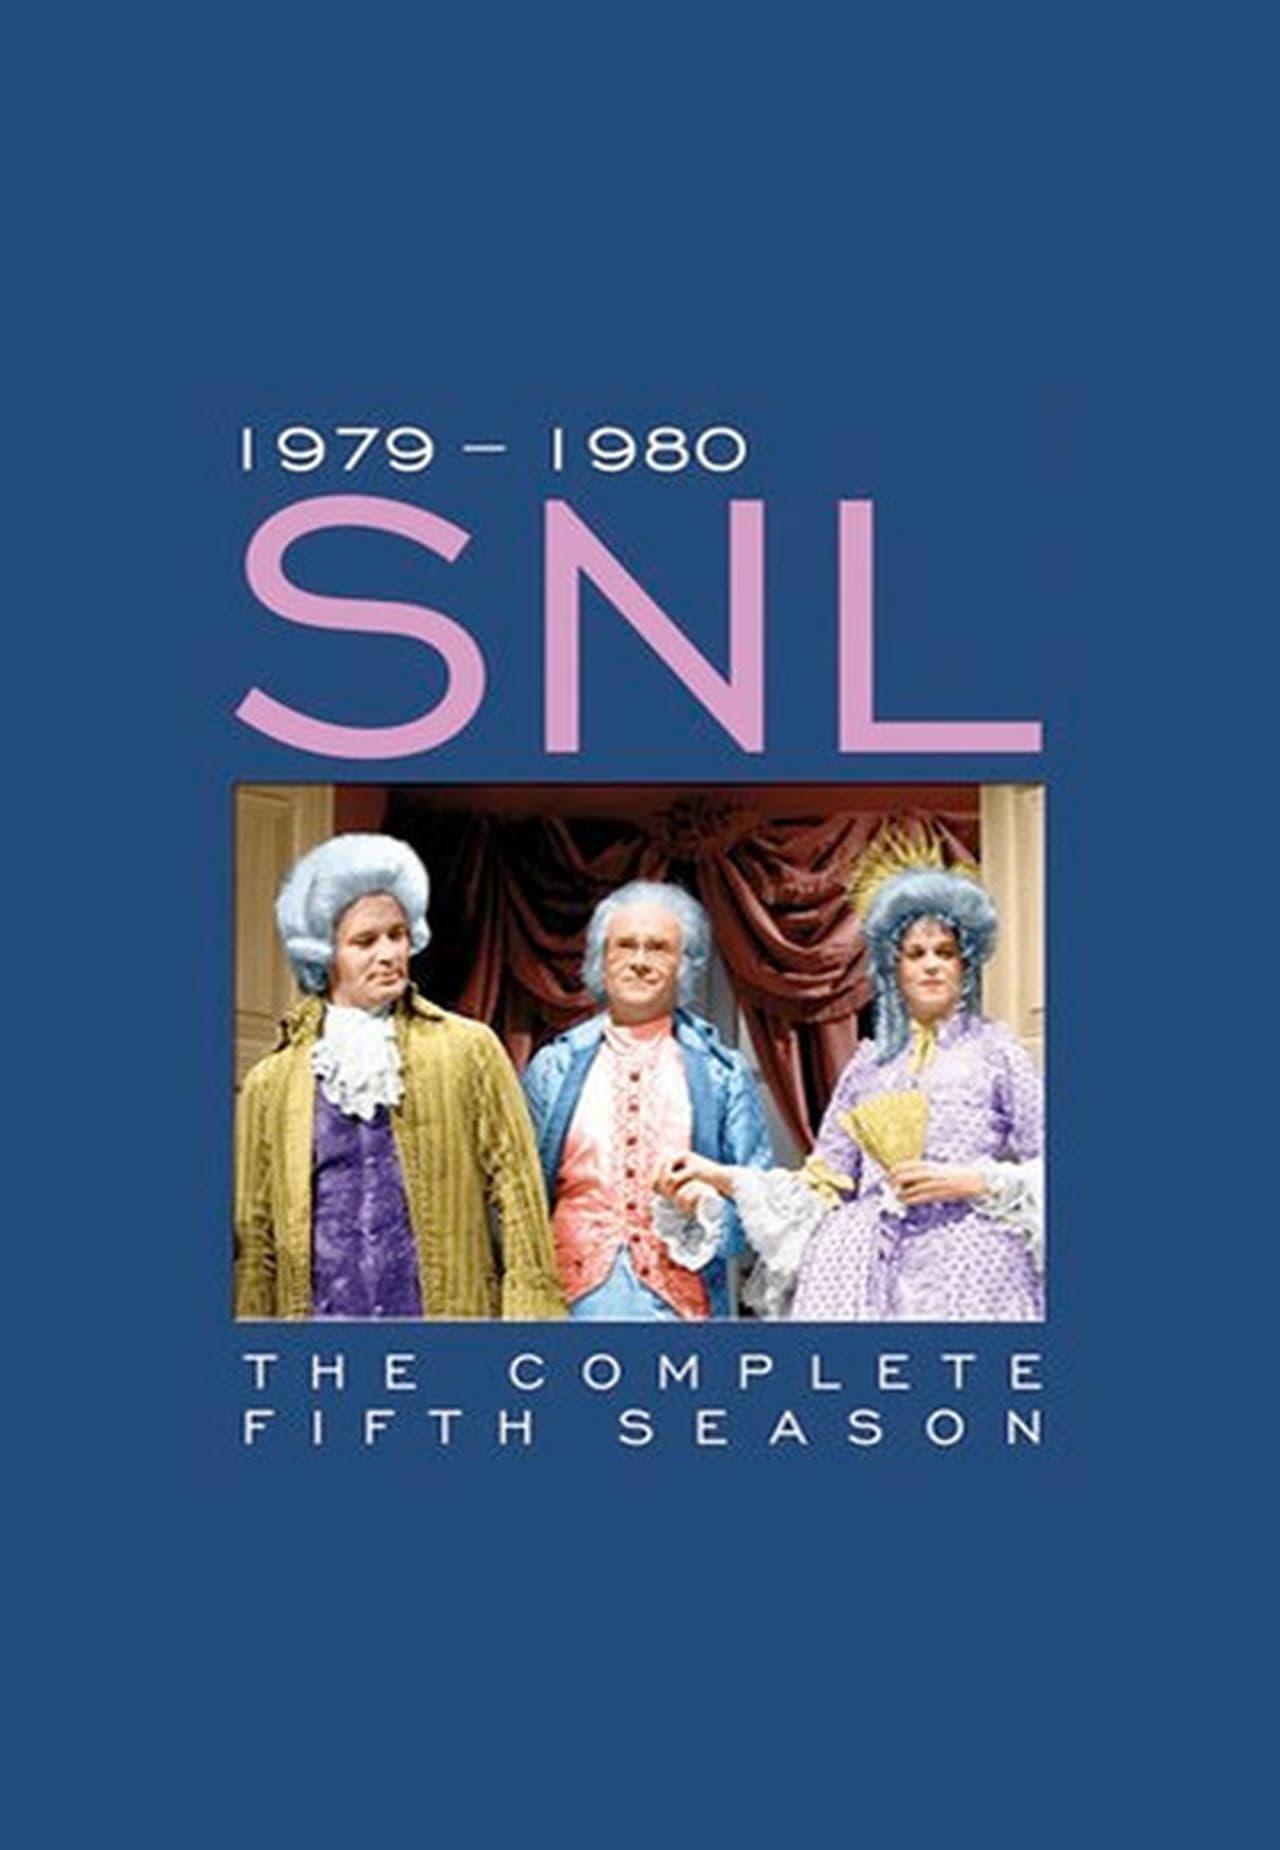 Saturday Night Live Season 5